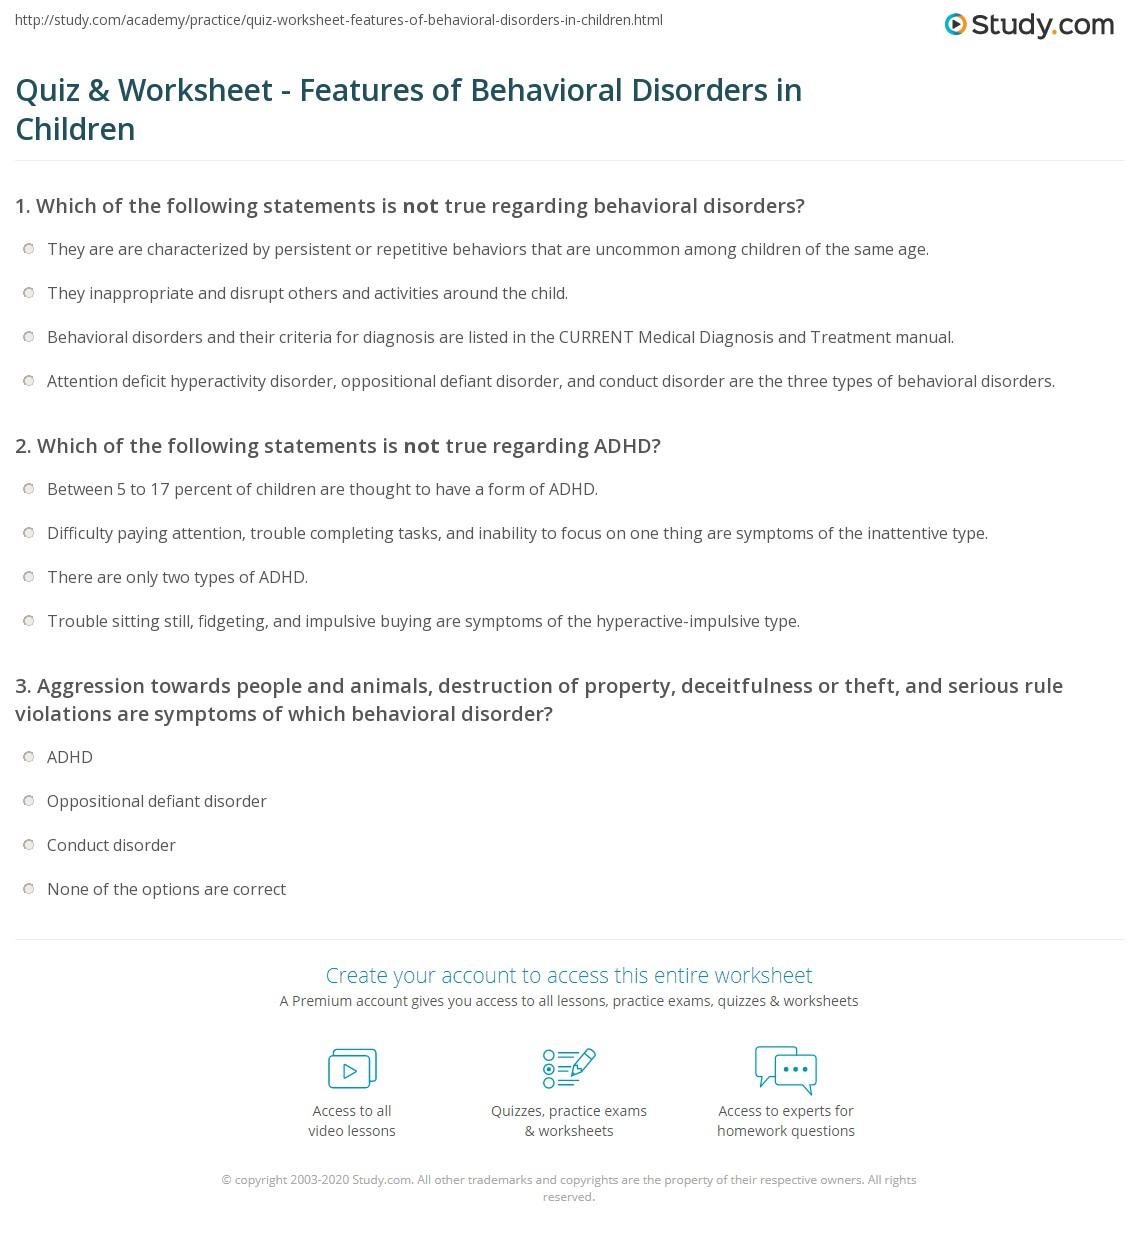 worksheet Oppositional Defiant Disorder Worksheets quiz worksheet features of behavioral disorders in children print definition symptoms worksheet